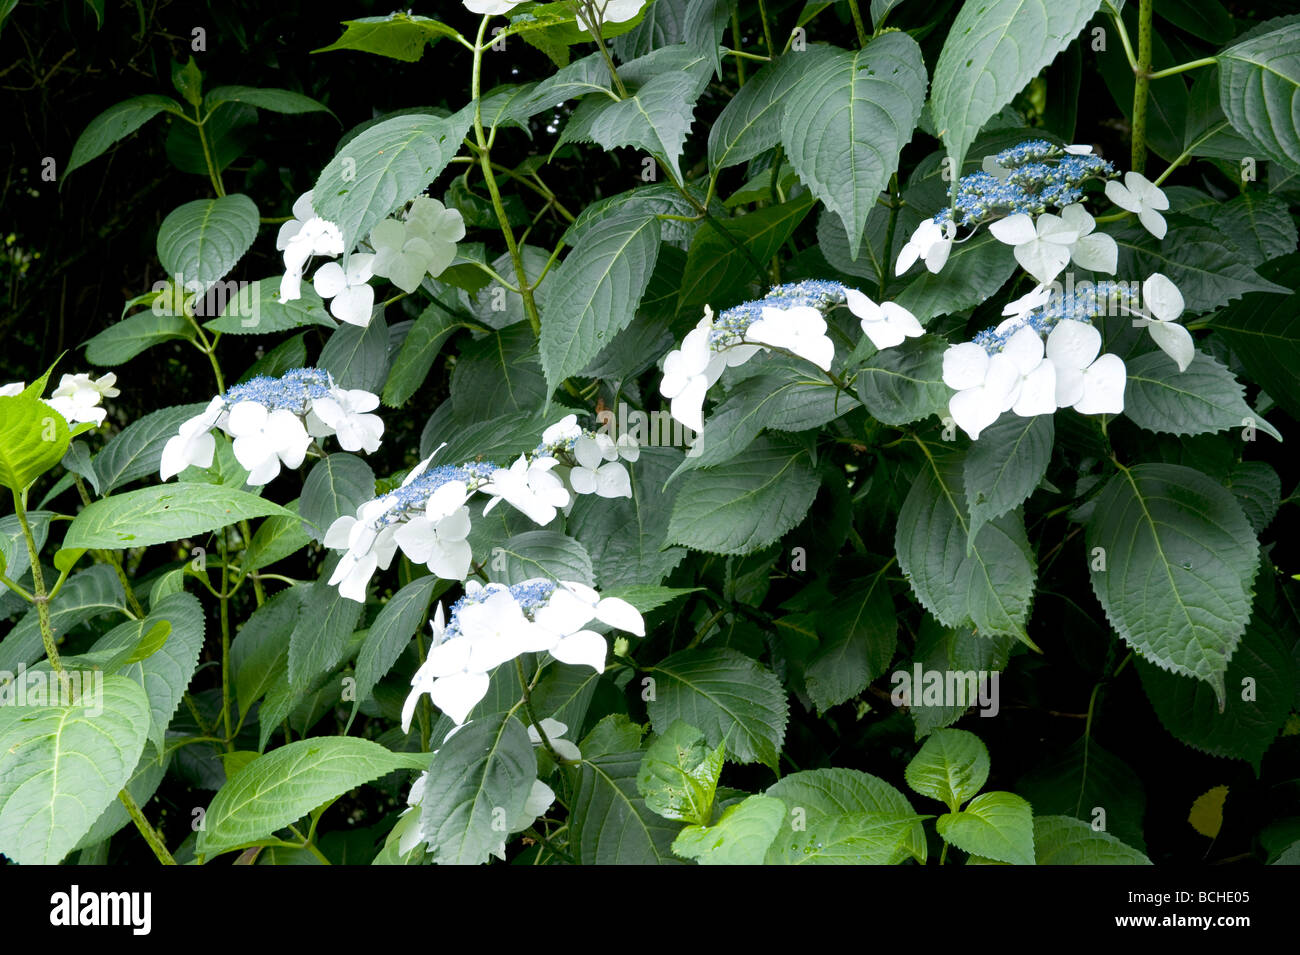 Hydrangeas macrophylla `Veitchii` blue & white flower - Stock Image